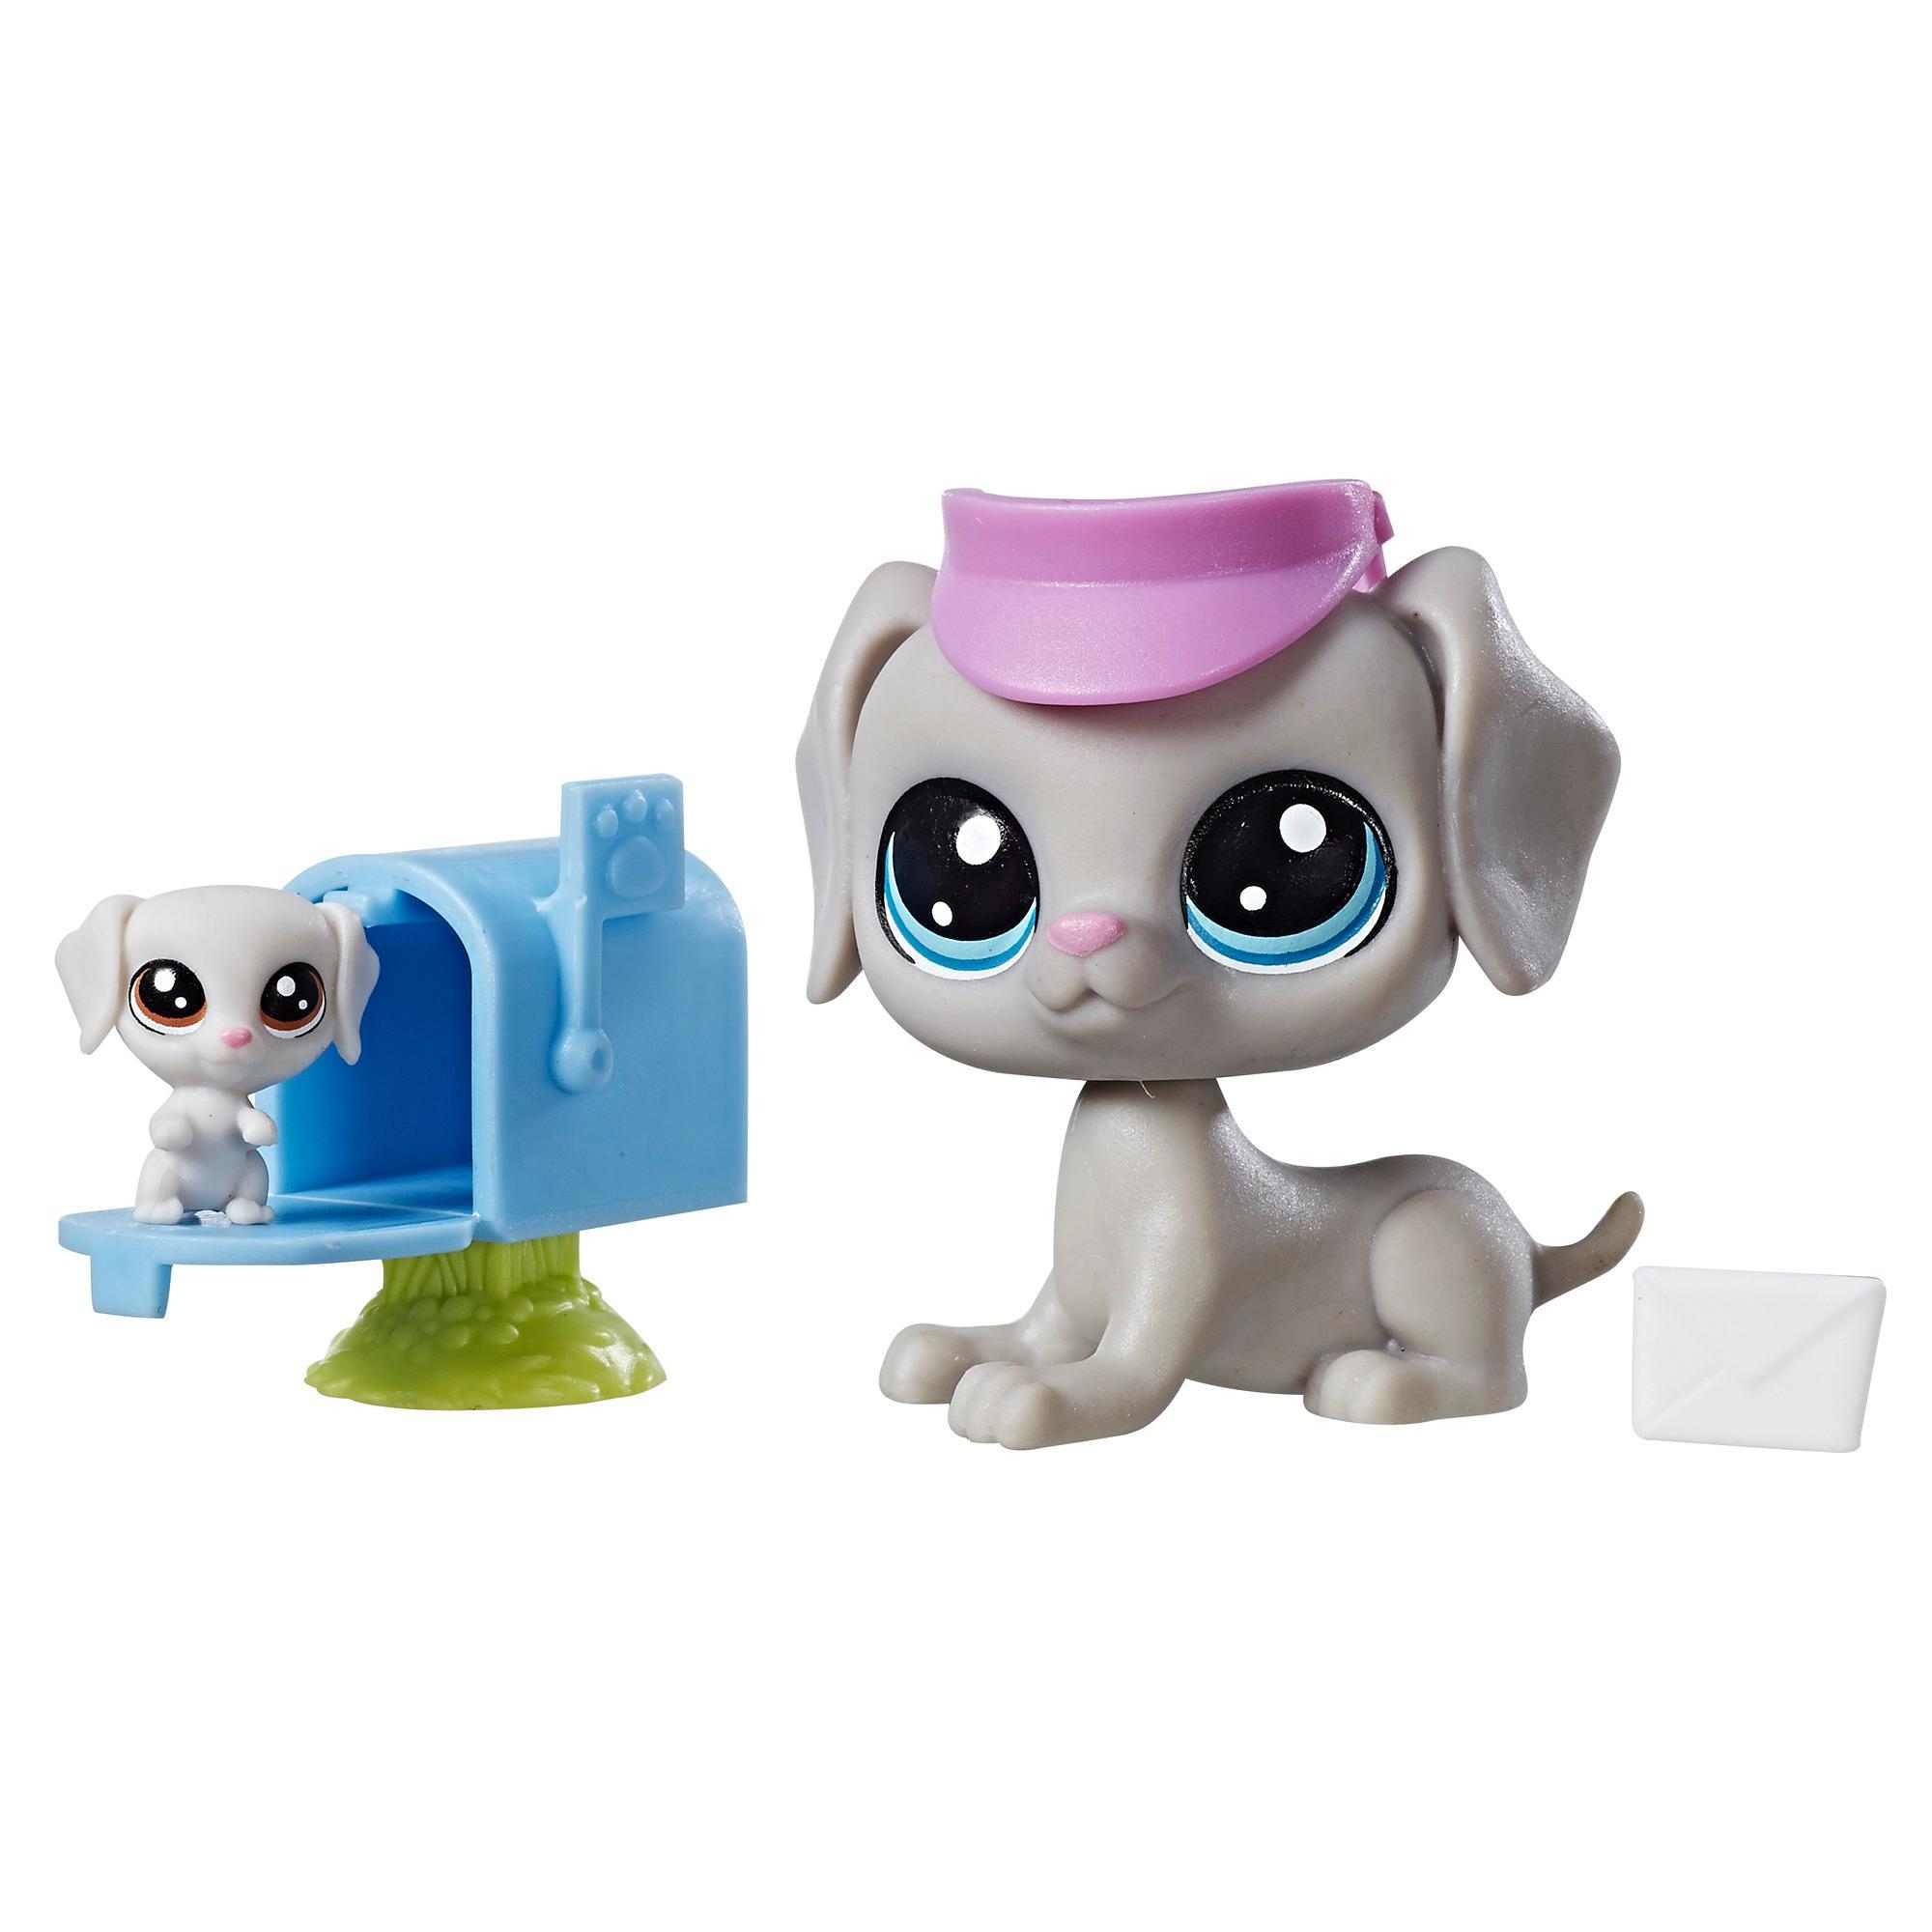 Littlest Pet Shop Bill Weimaran/Bertie Weimaran